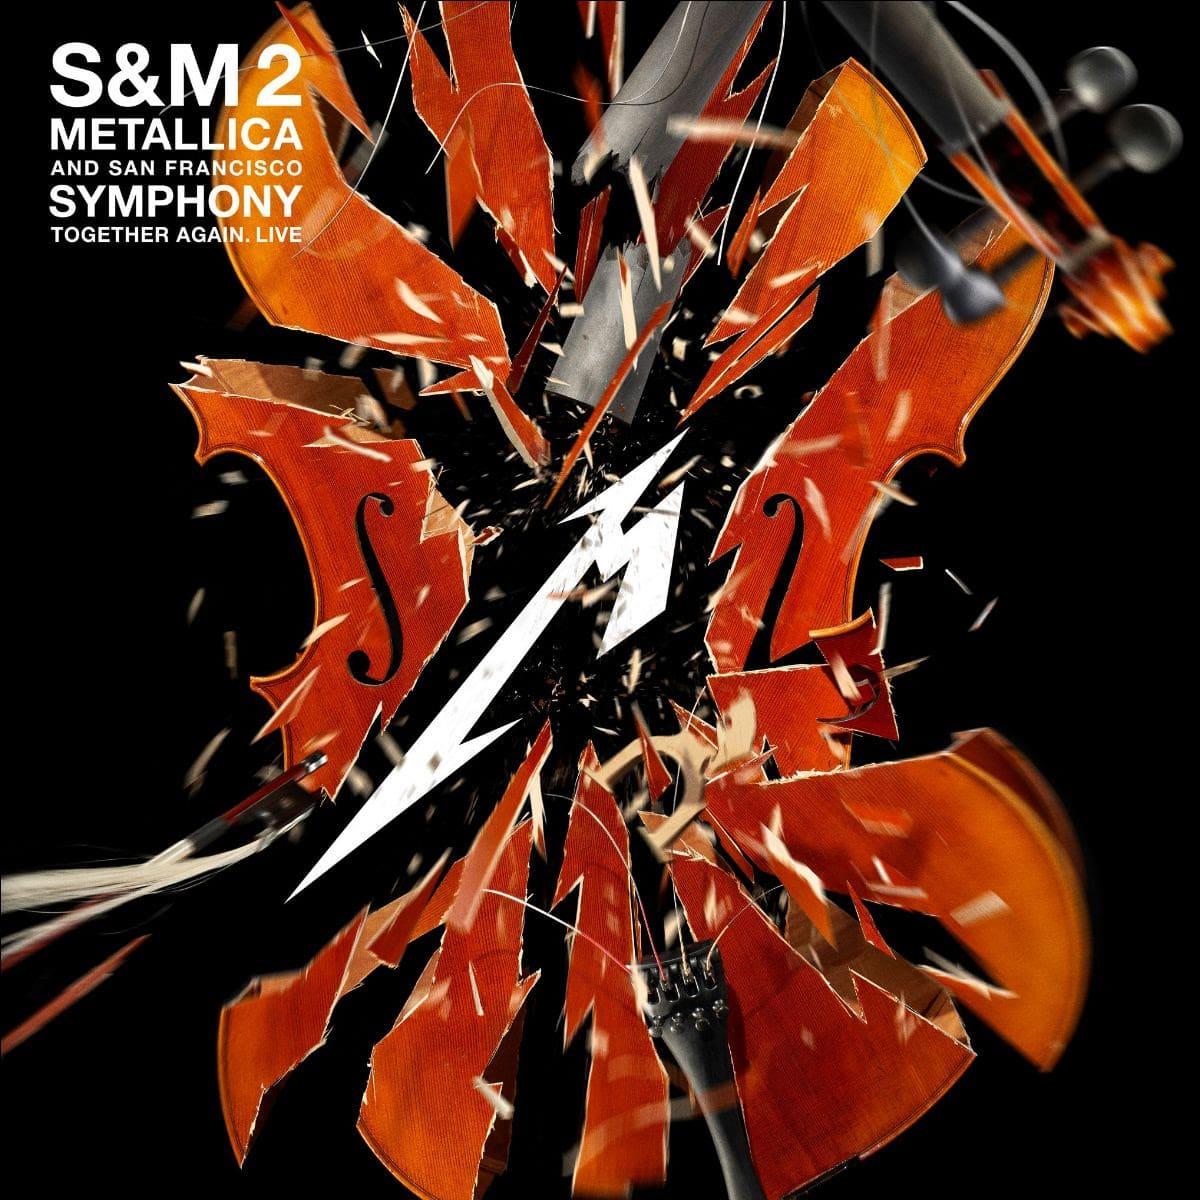 metallica-san-francisco-symphony-sm2